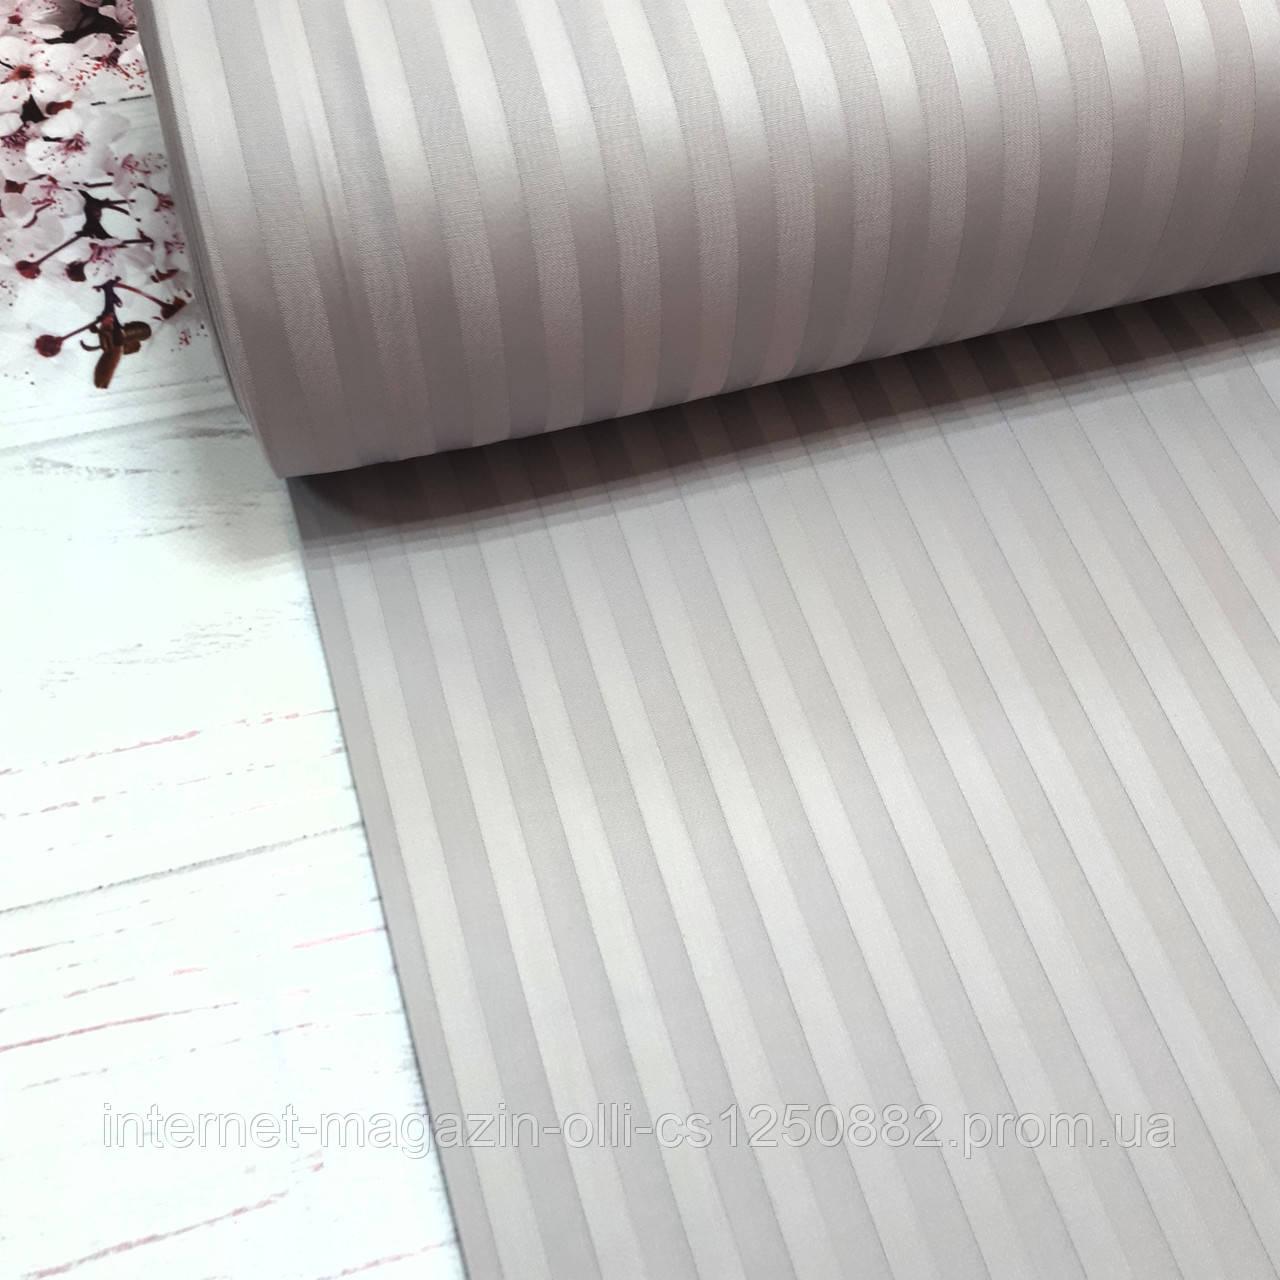 Сатин 100% хлопок  (ТУРЦИЯ шир. 2,4 м) Stripes серый ОТРЕЗ(0,8*2,,4)